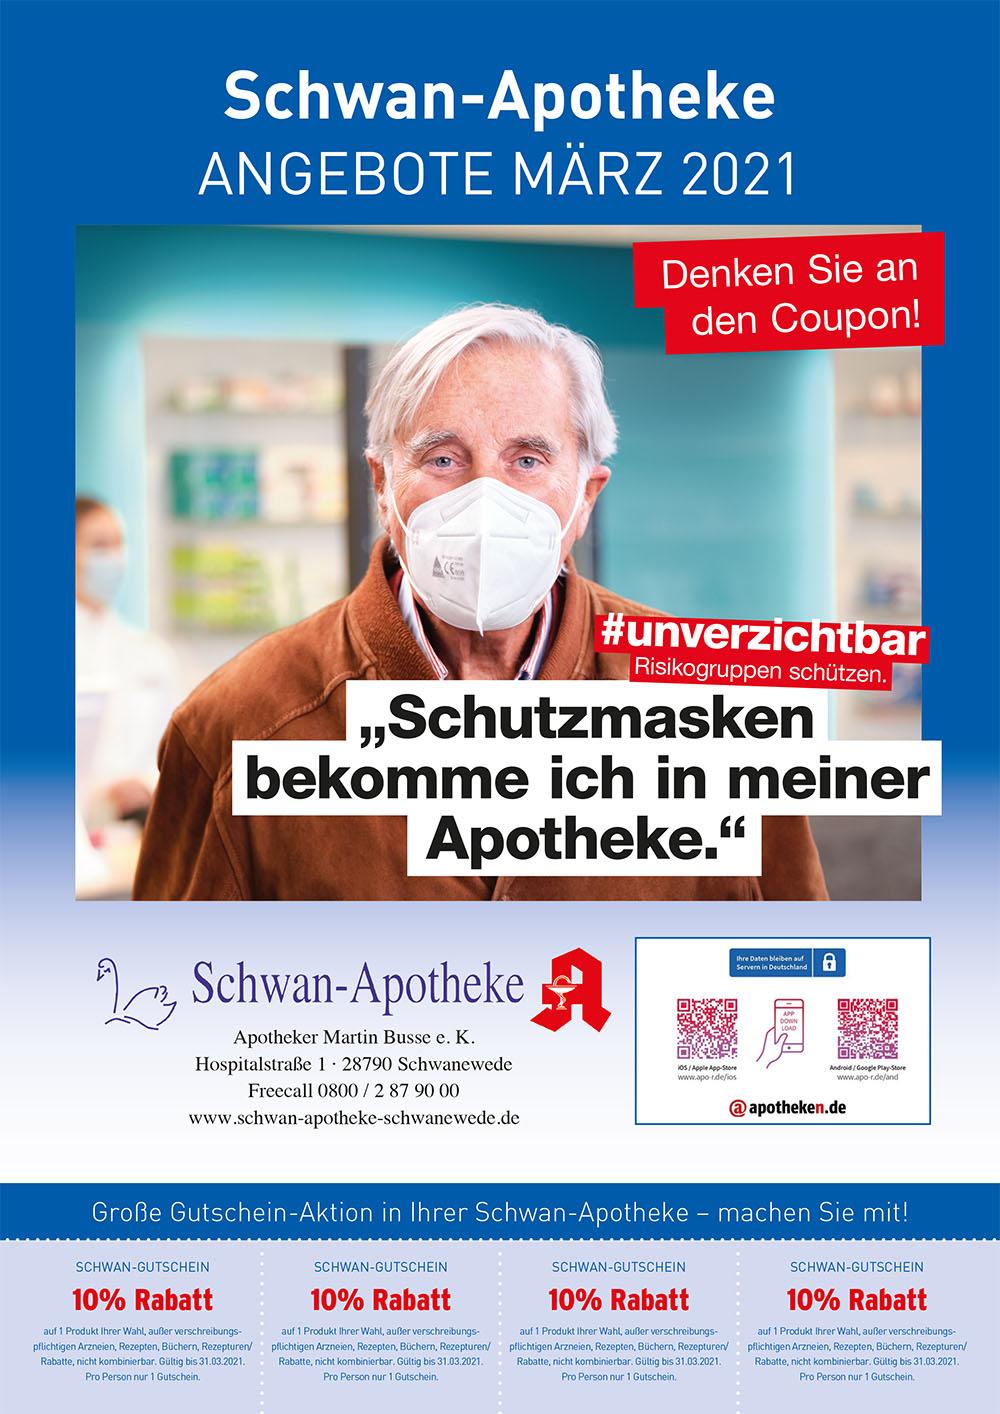 http://www.apotheken.de/fileadmin/clubarea/00000-Angebote/28790_schwan_angebot_1.jpg